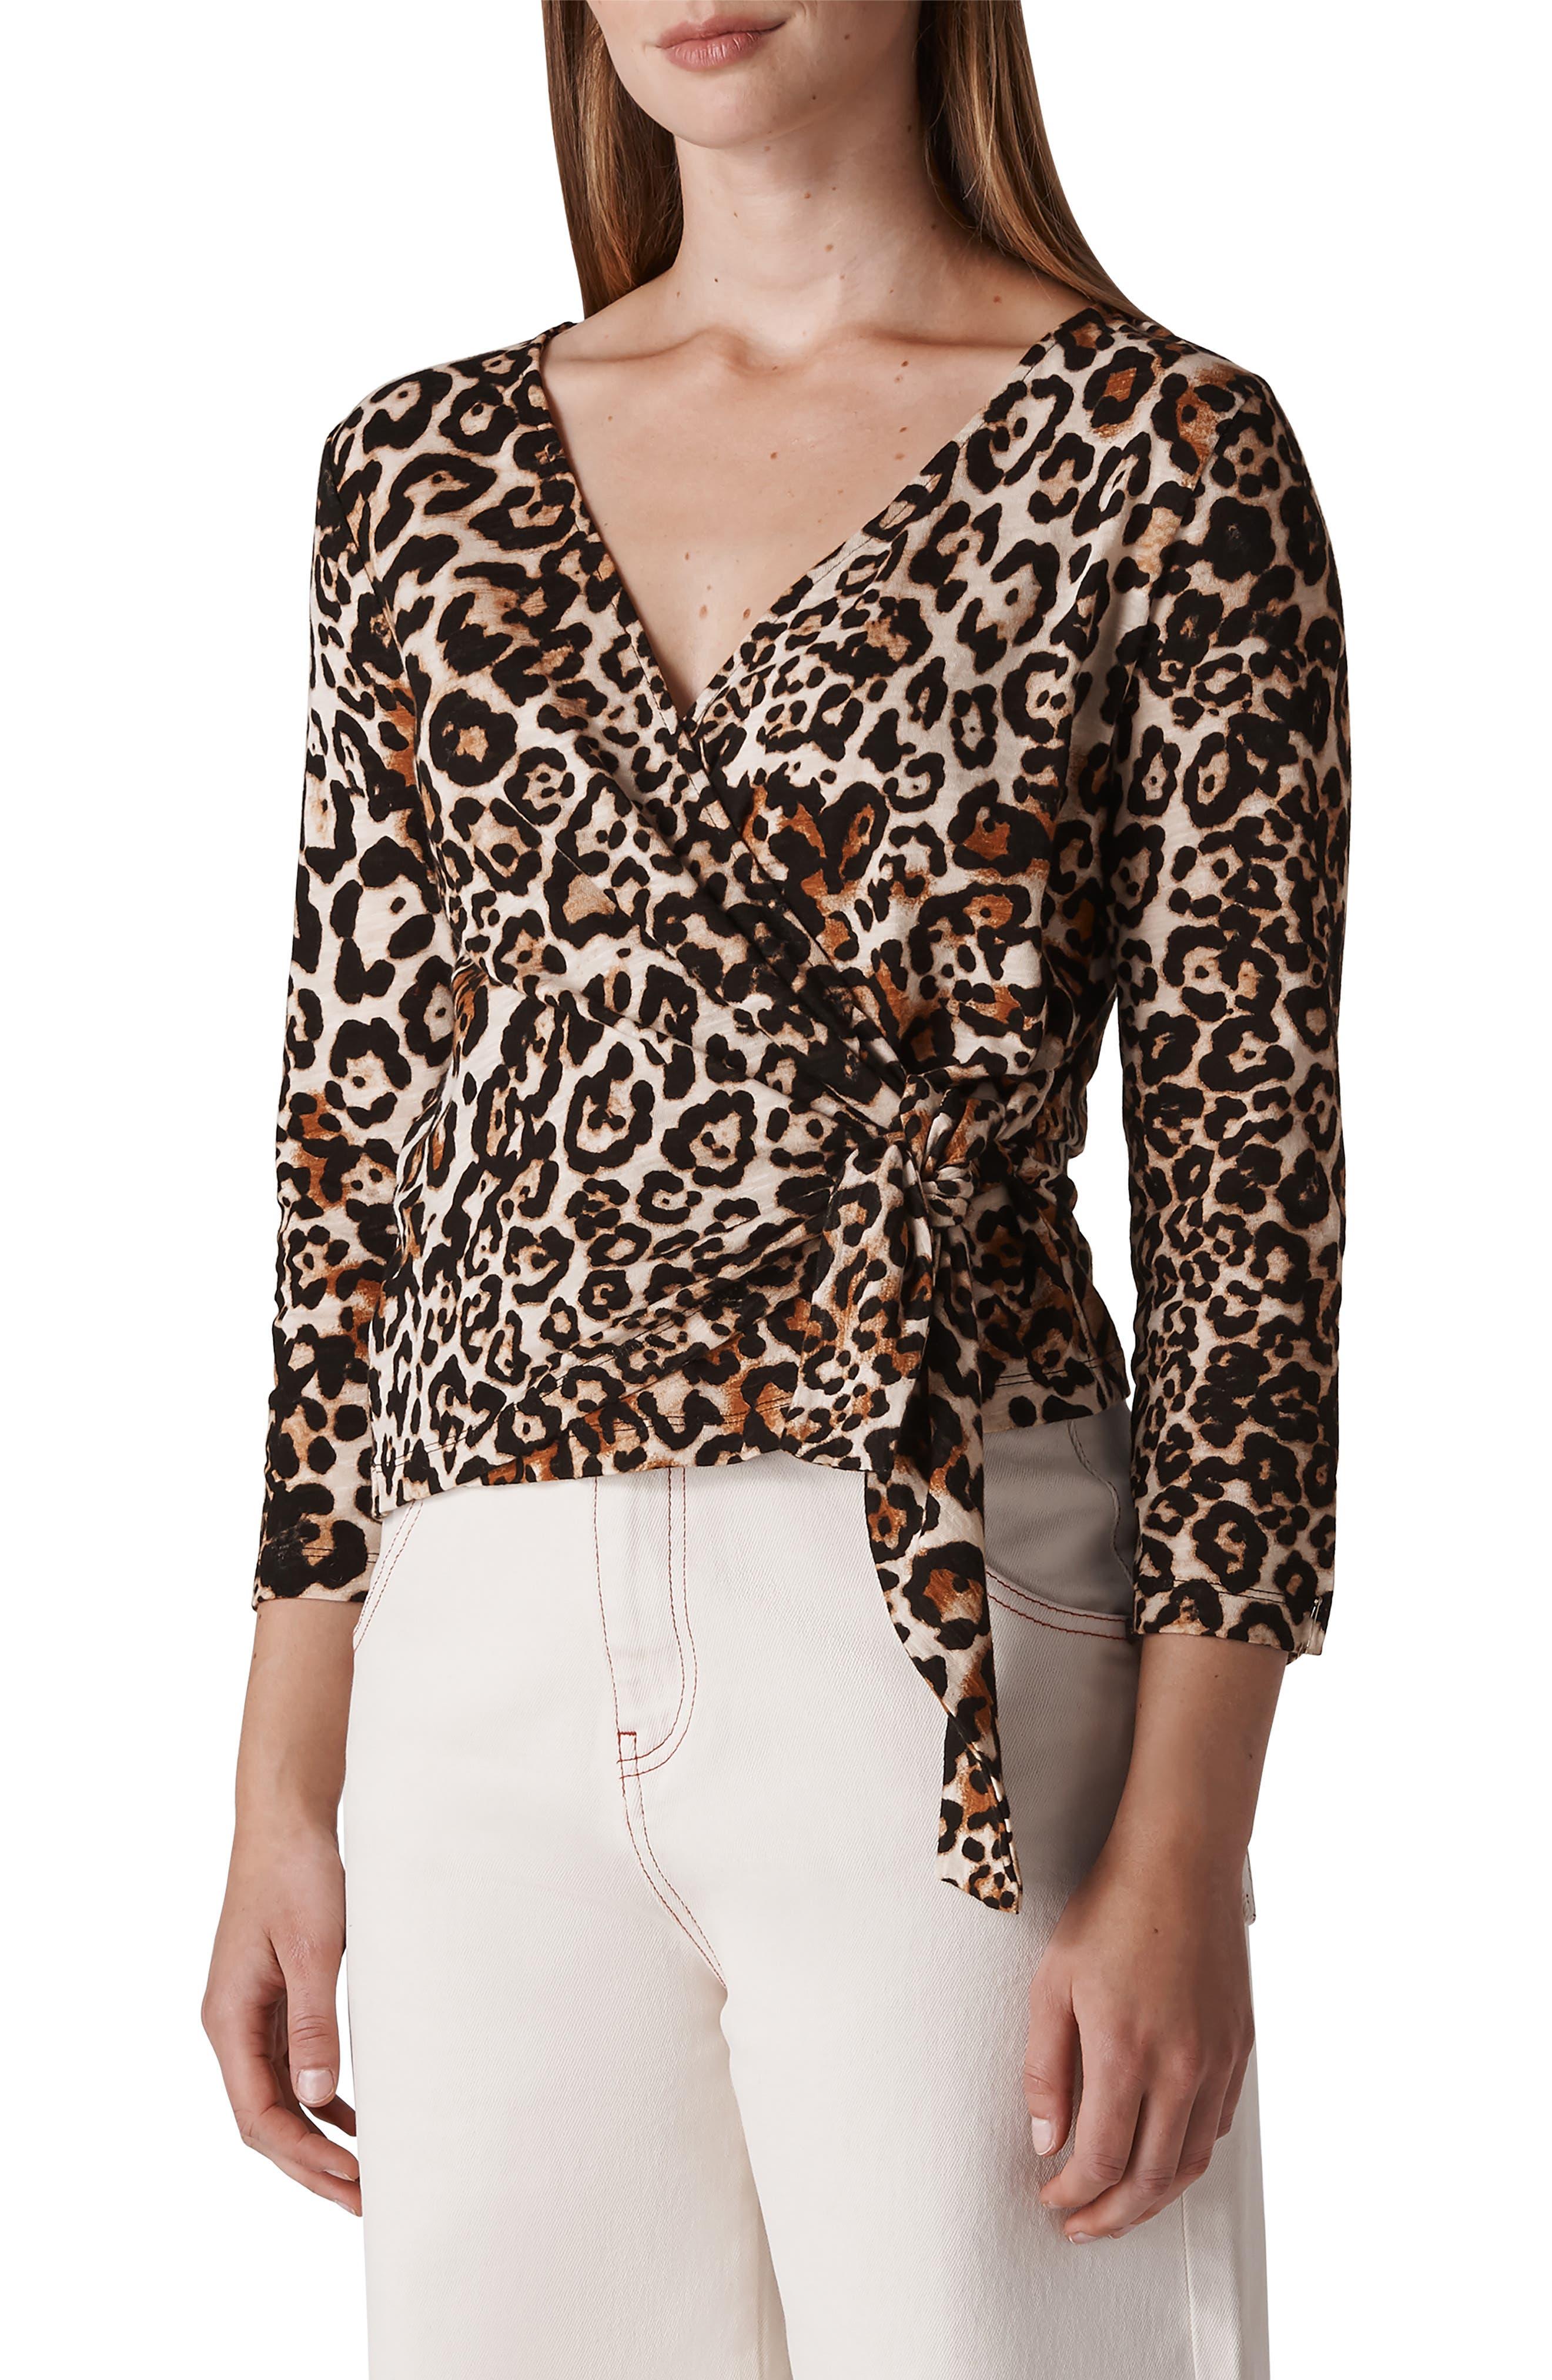 WHISTLES Leopard Print Wrap Top, Main, color, 200